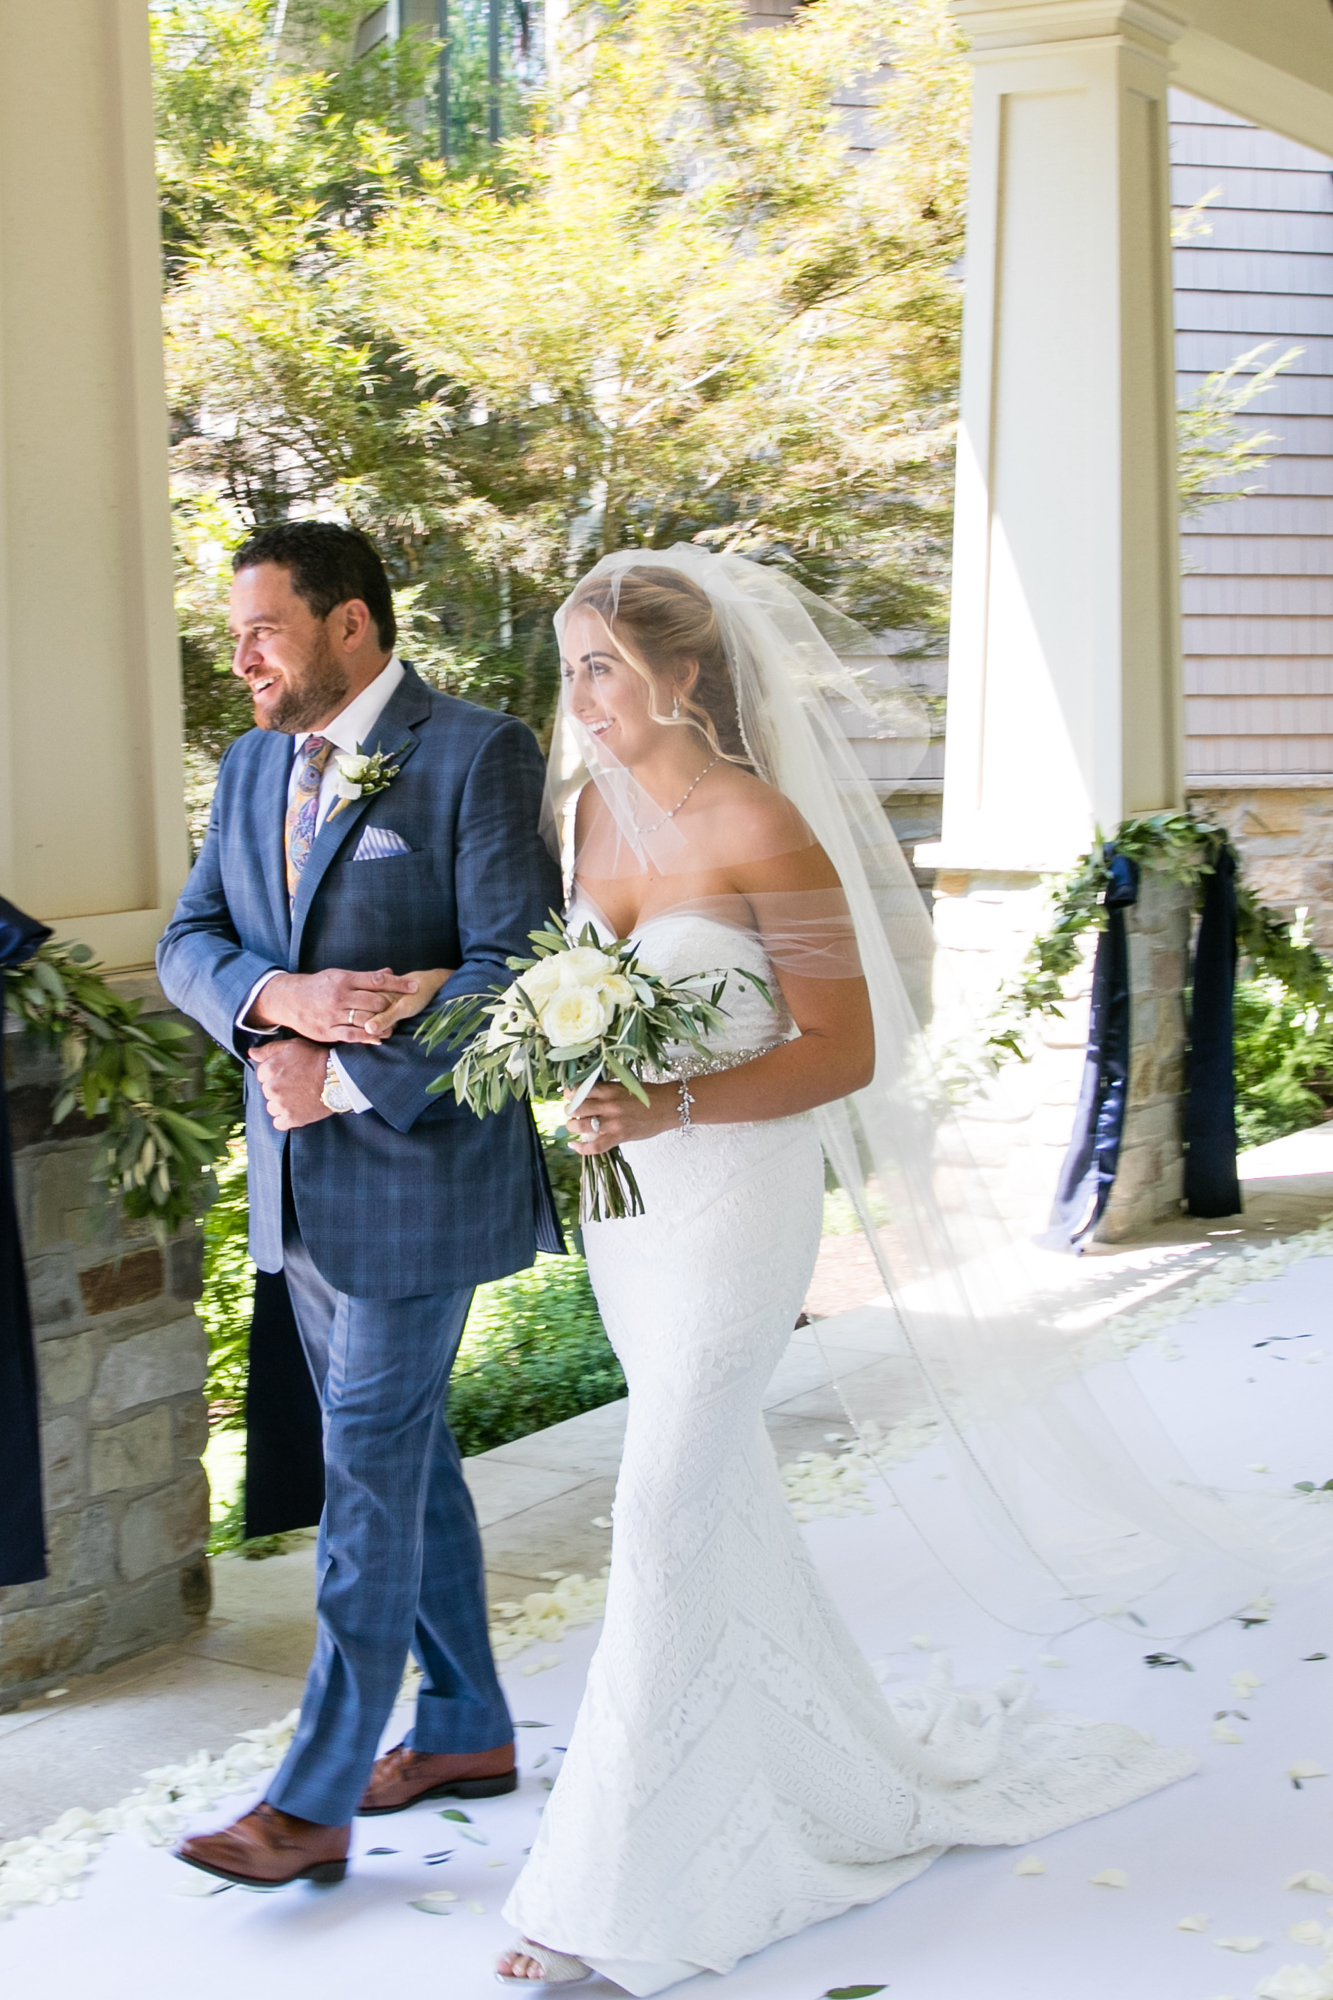 greek-wedding-salt-lake-city-utah-14.jpg